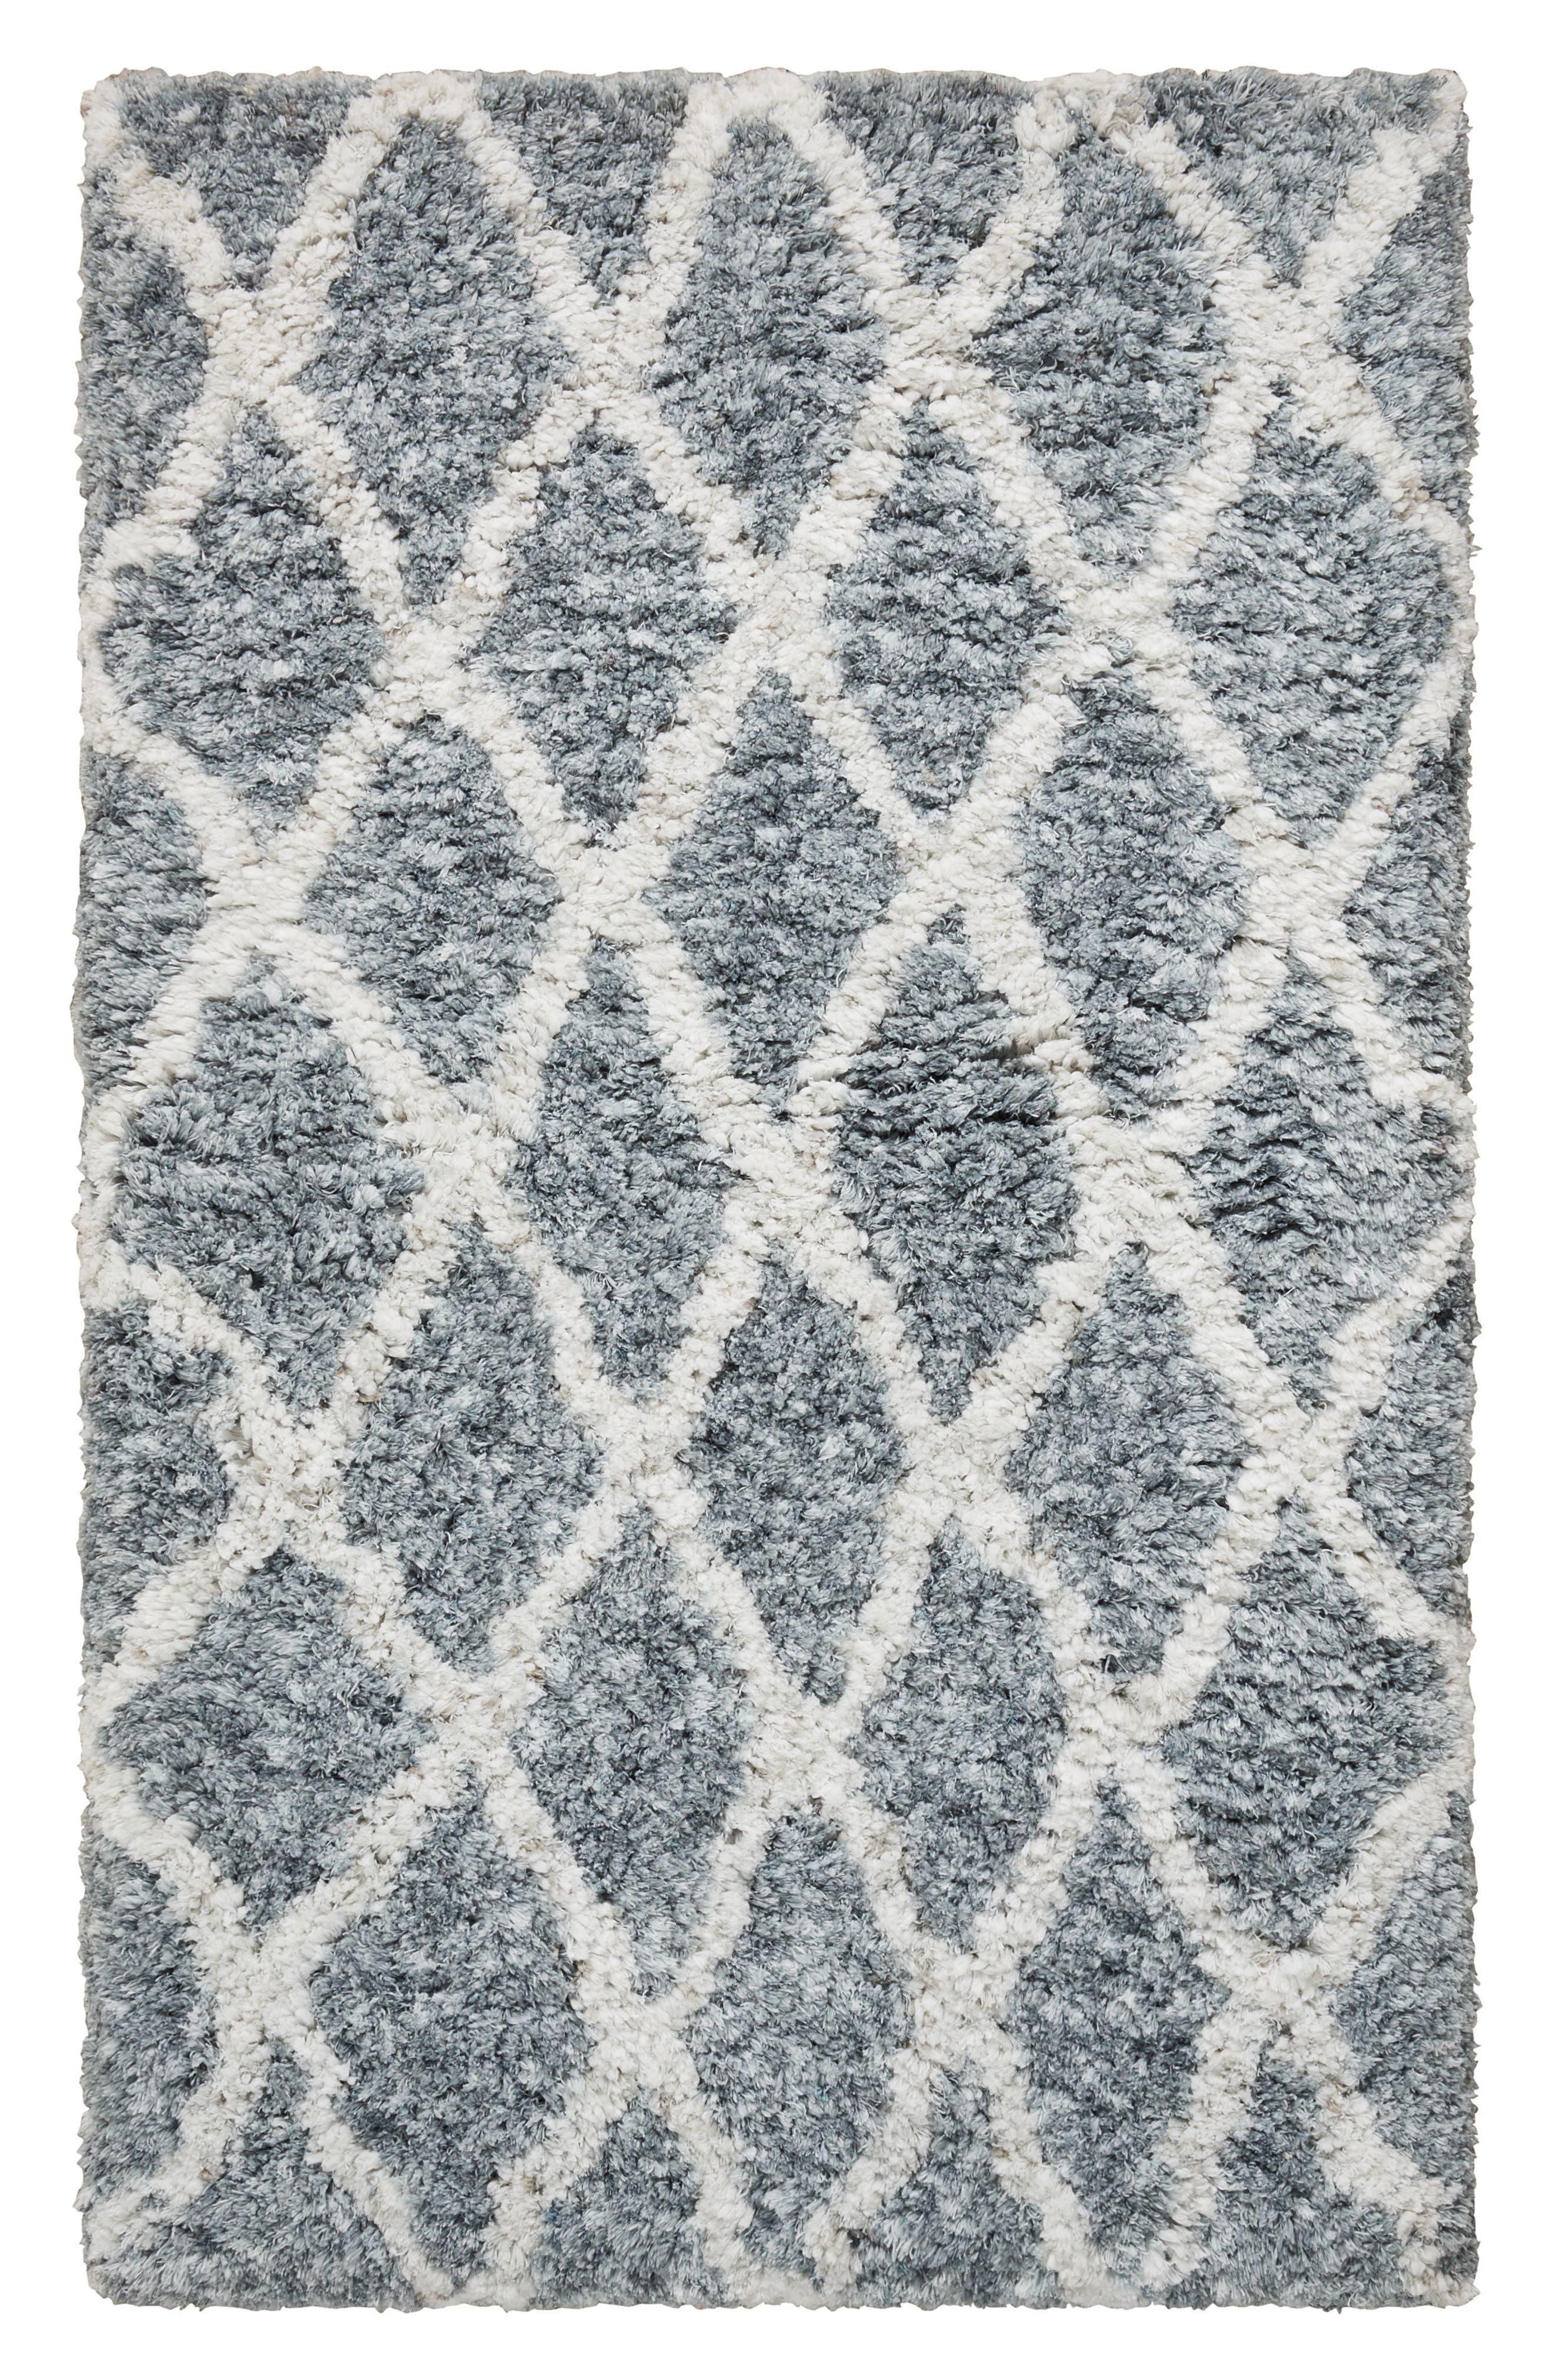 Irregular Diamond Rug,                             Main thumbnail 1, color,                             Grey